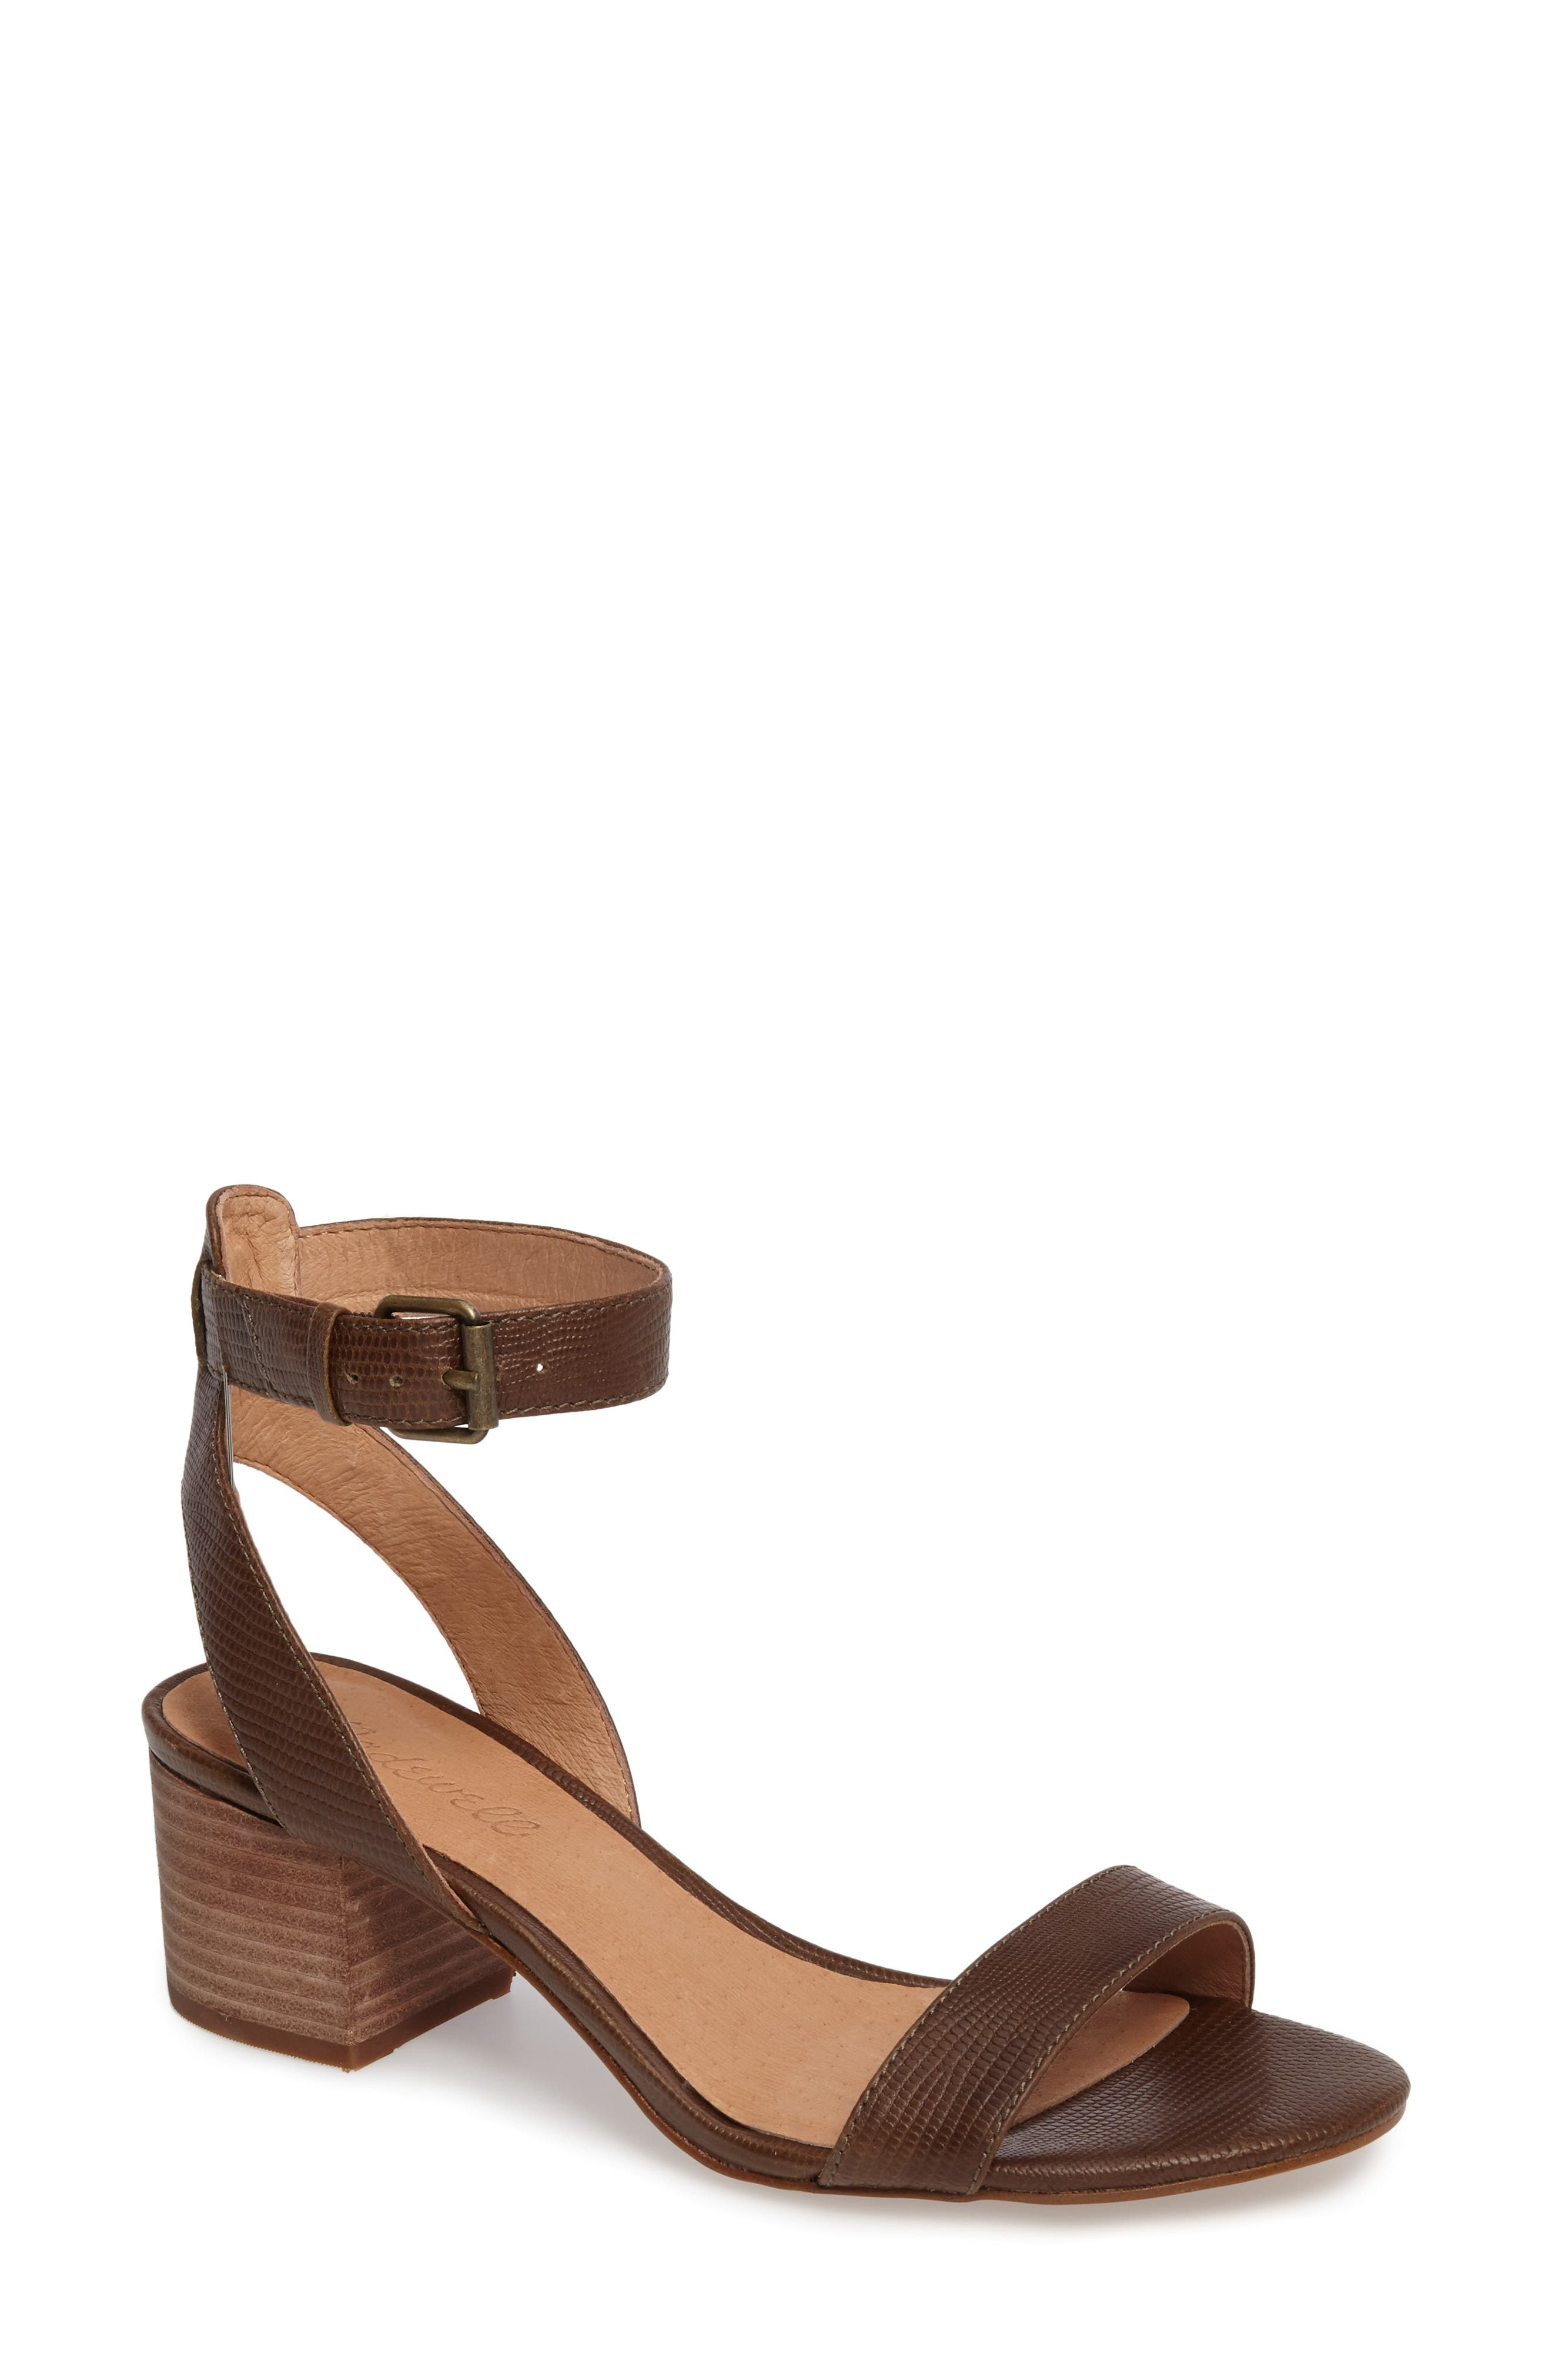 Alice Embossed Ankle Wrap Sandal,                             Main thumbnail 1, color,                             Safari Khaki Leather